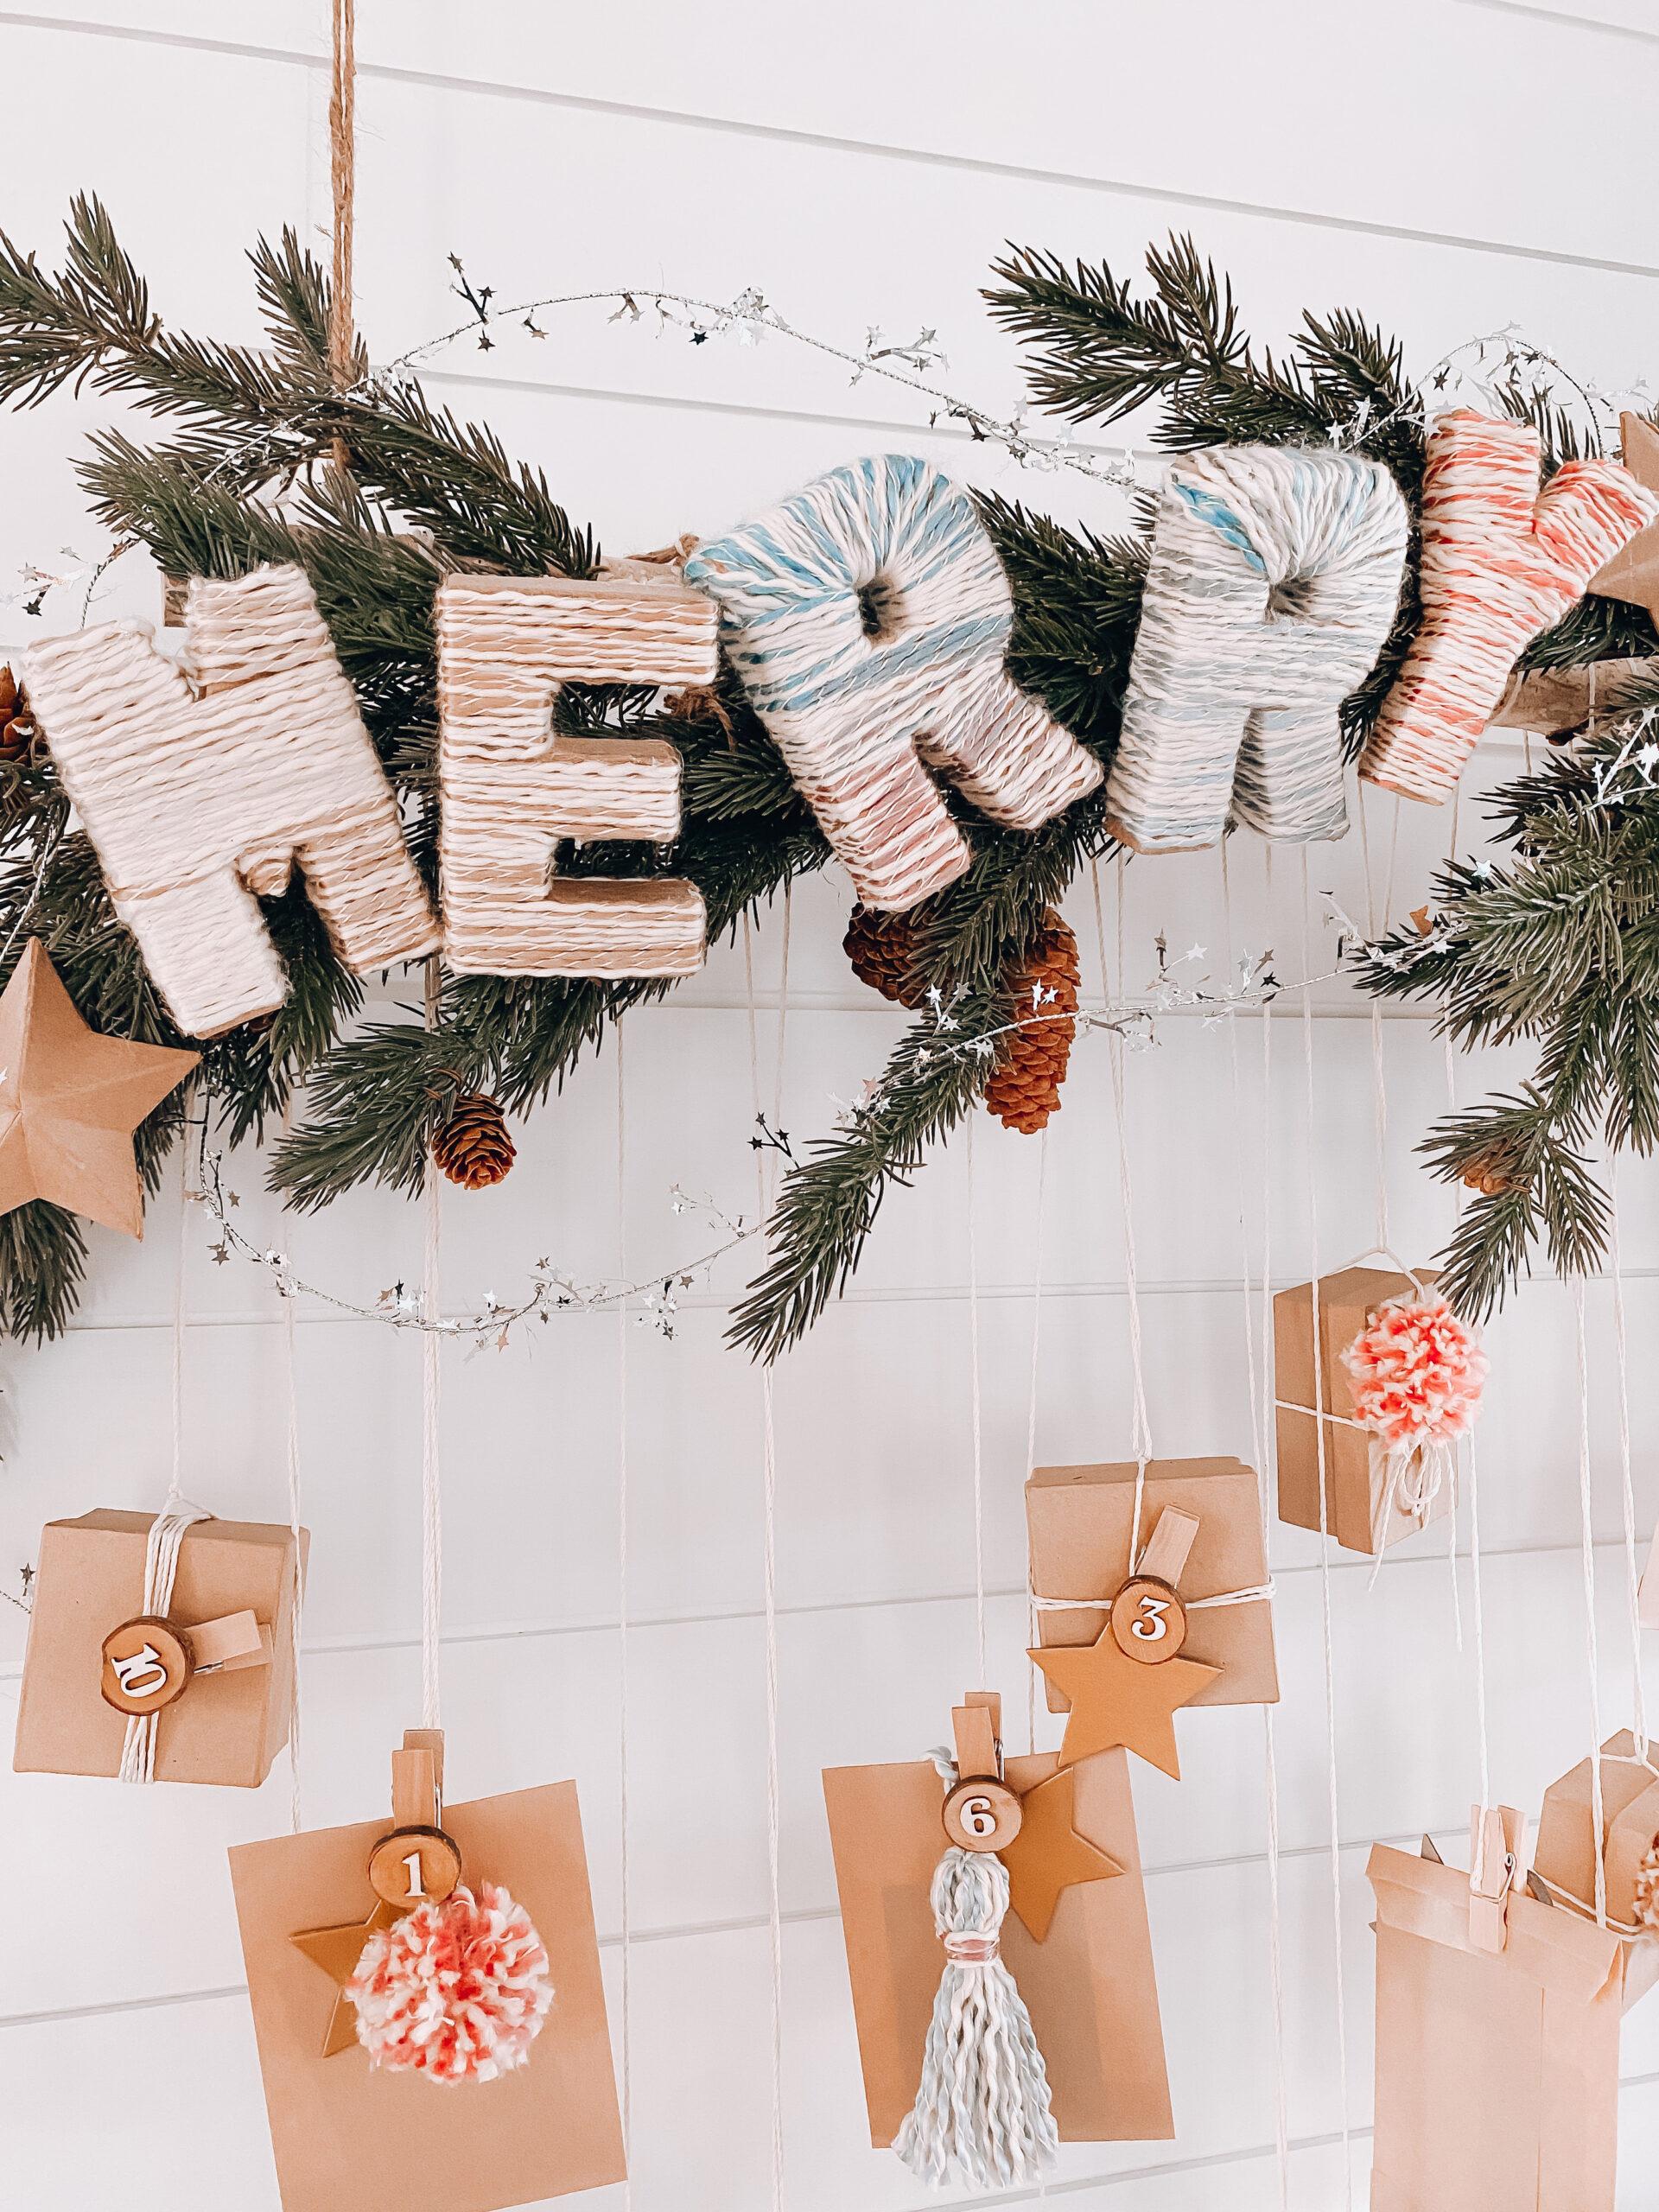 Advent Calendar, merry decor, advent calendar gift boxes